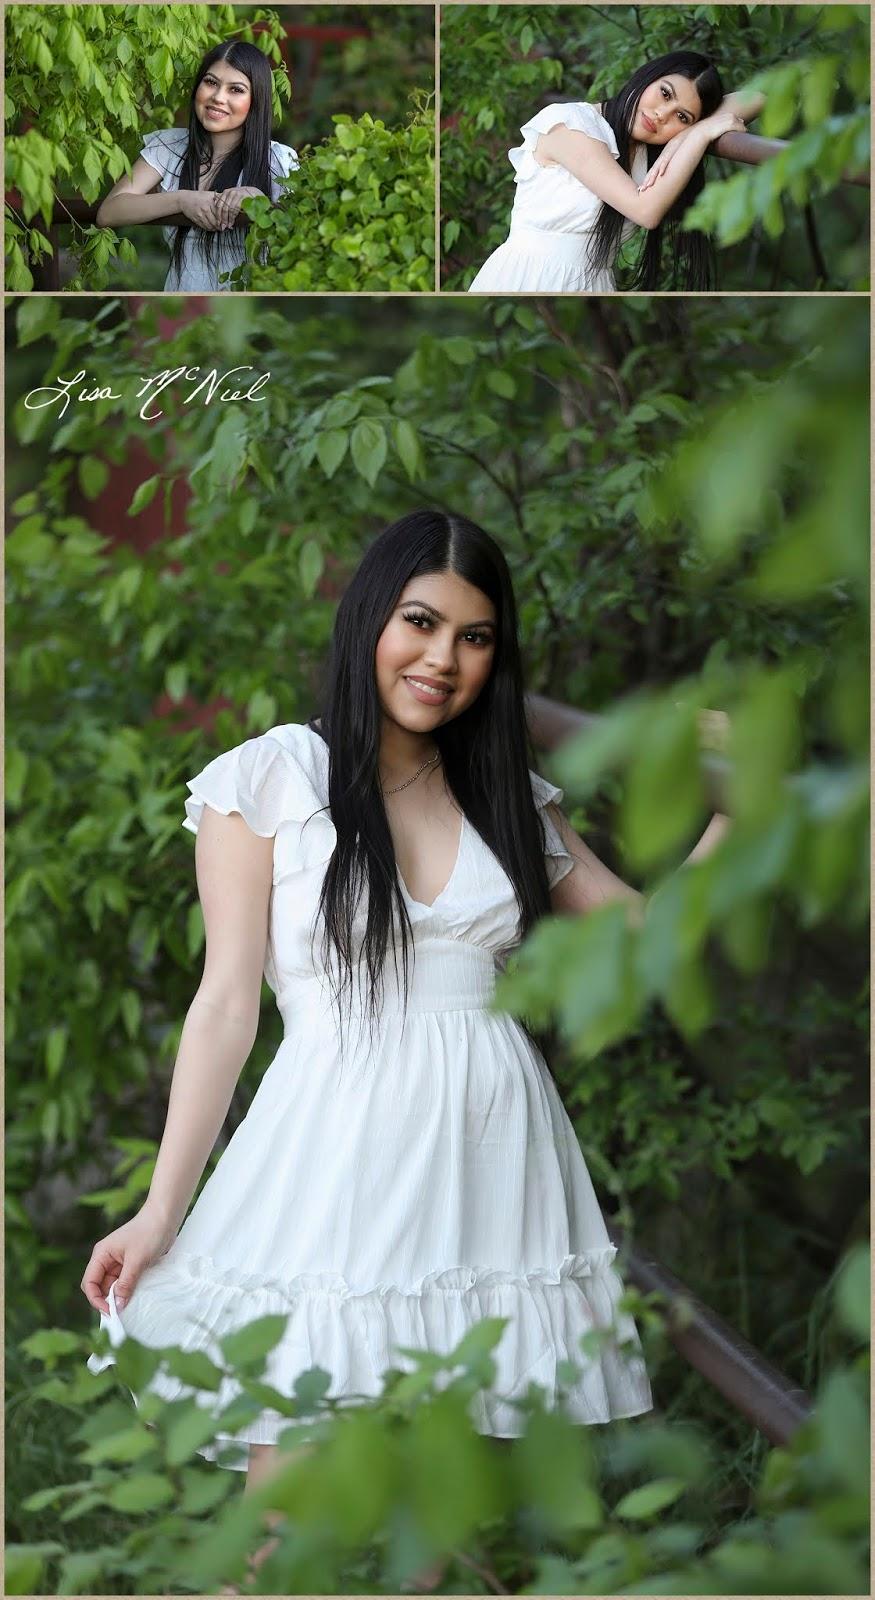 teen girl in white dress in greenery